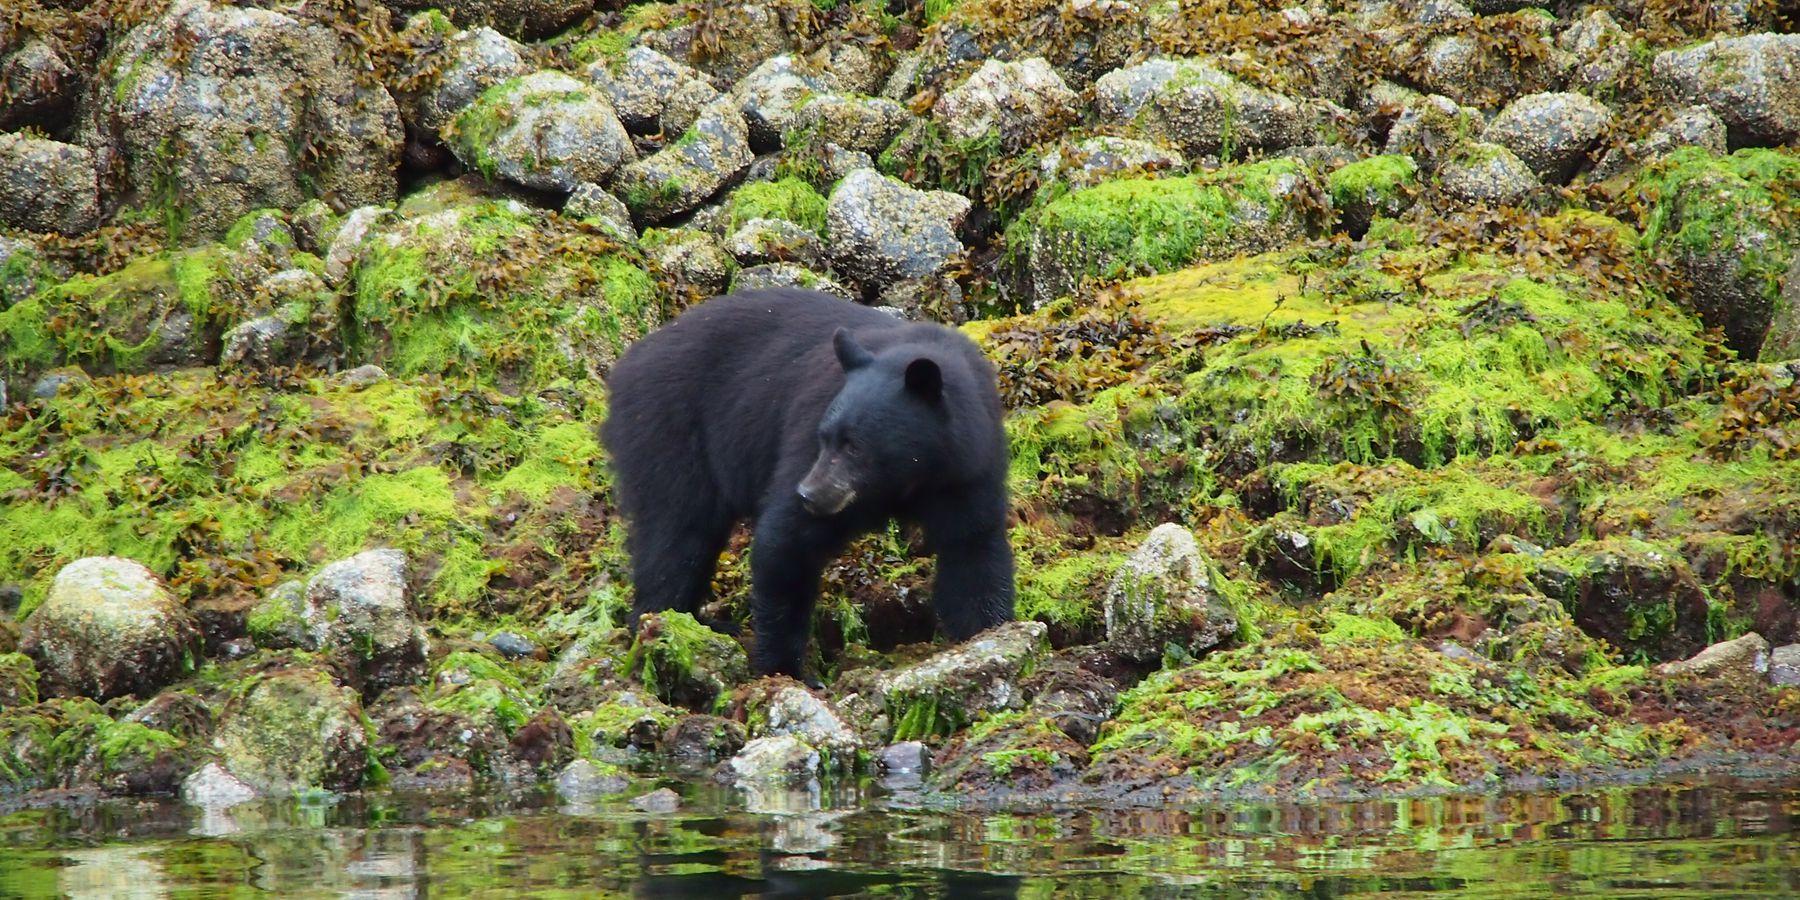 Wildlife Pacific Rim National Park - Vancouver Island - British Columbia - Canada - Doets Reizen